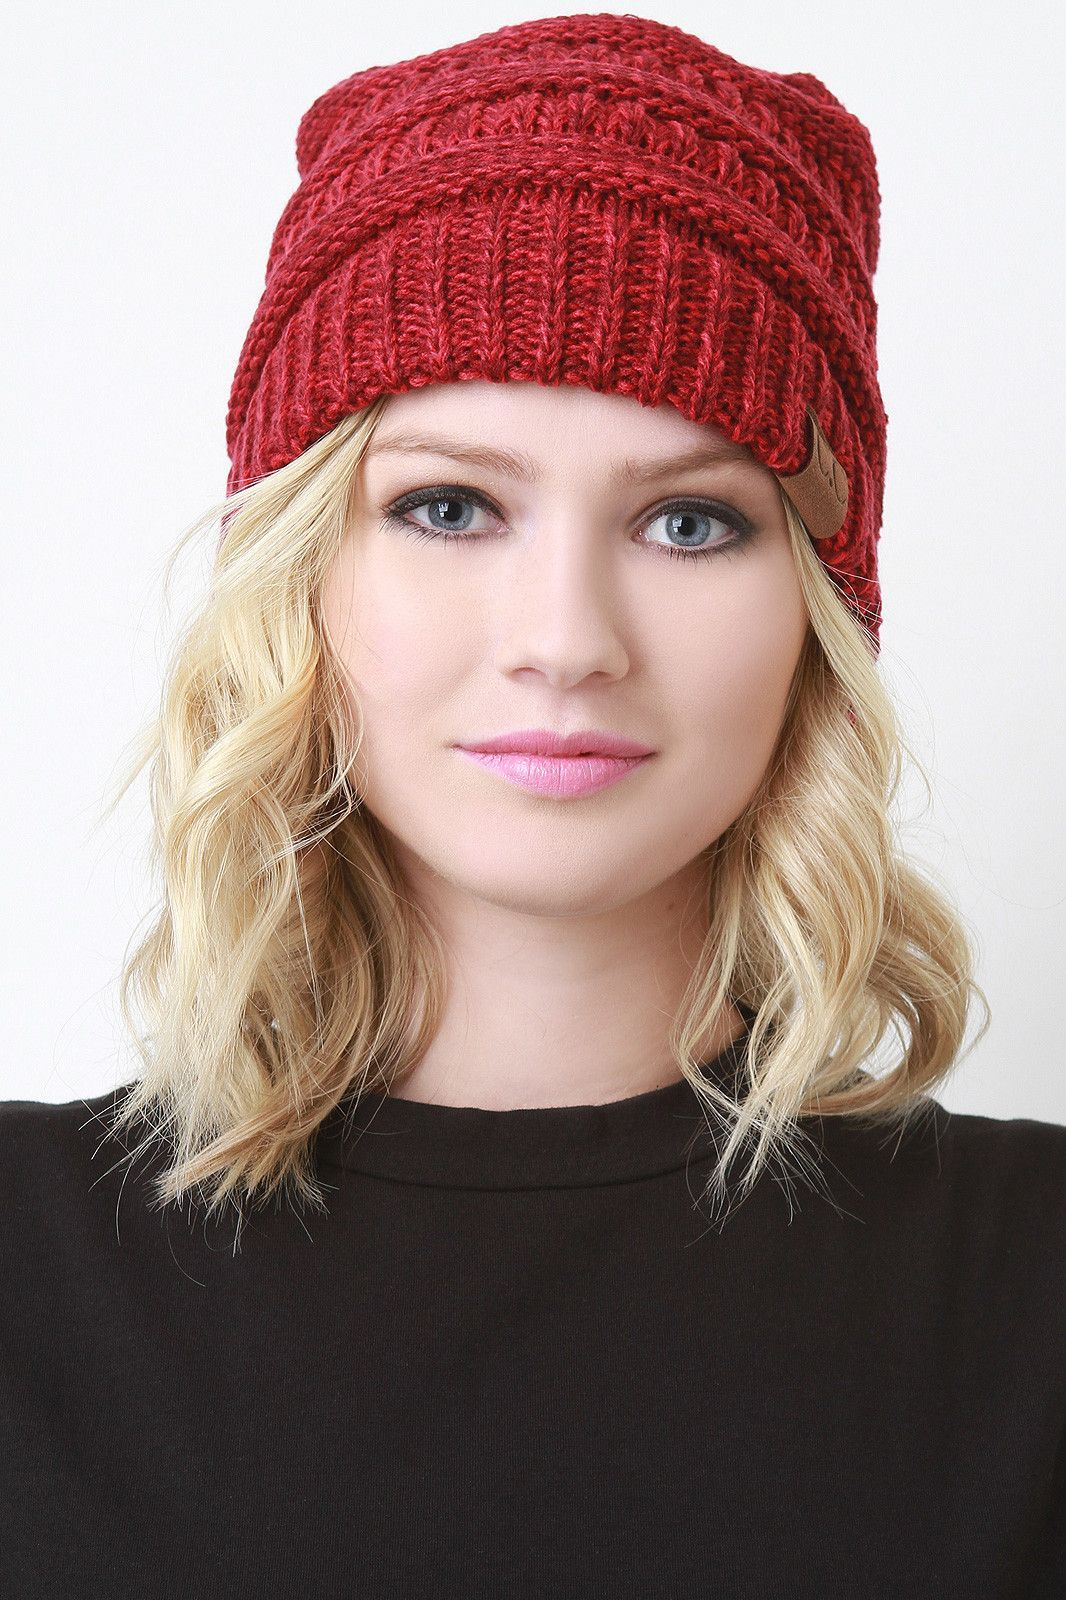 How to floppy wear knit hat